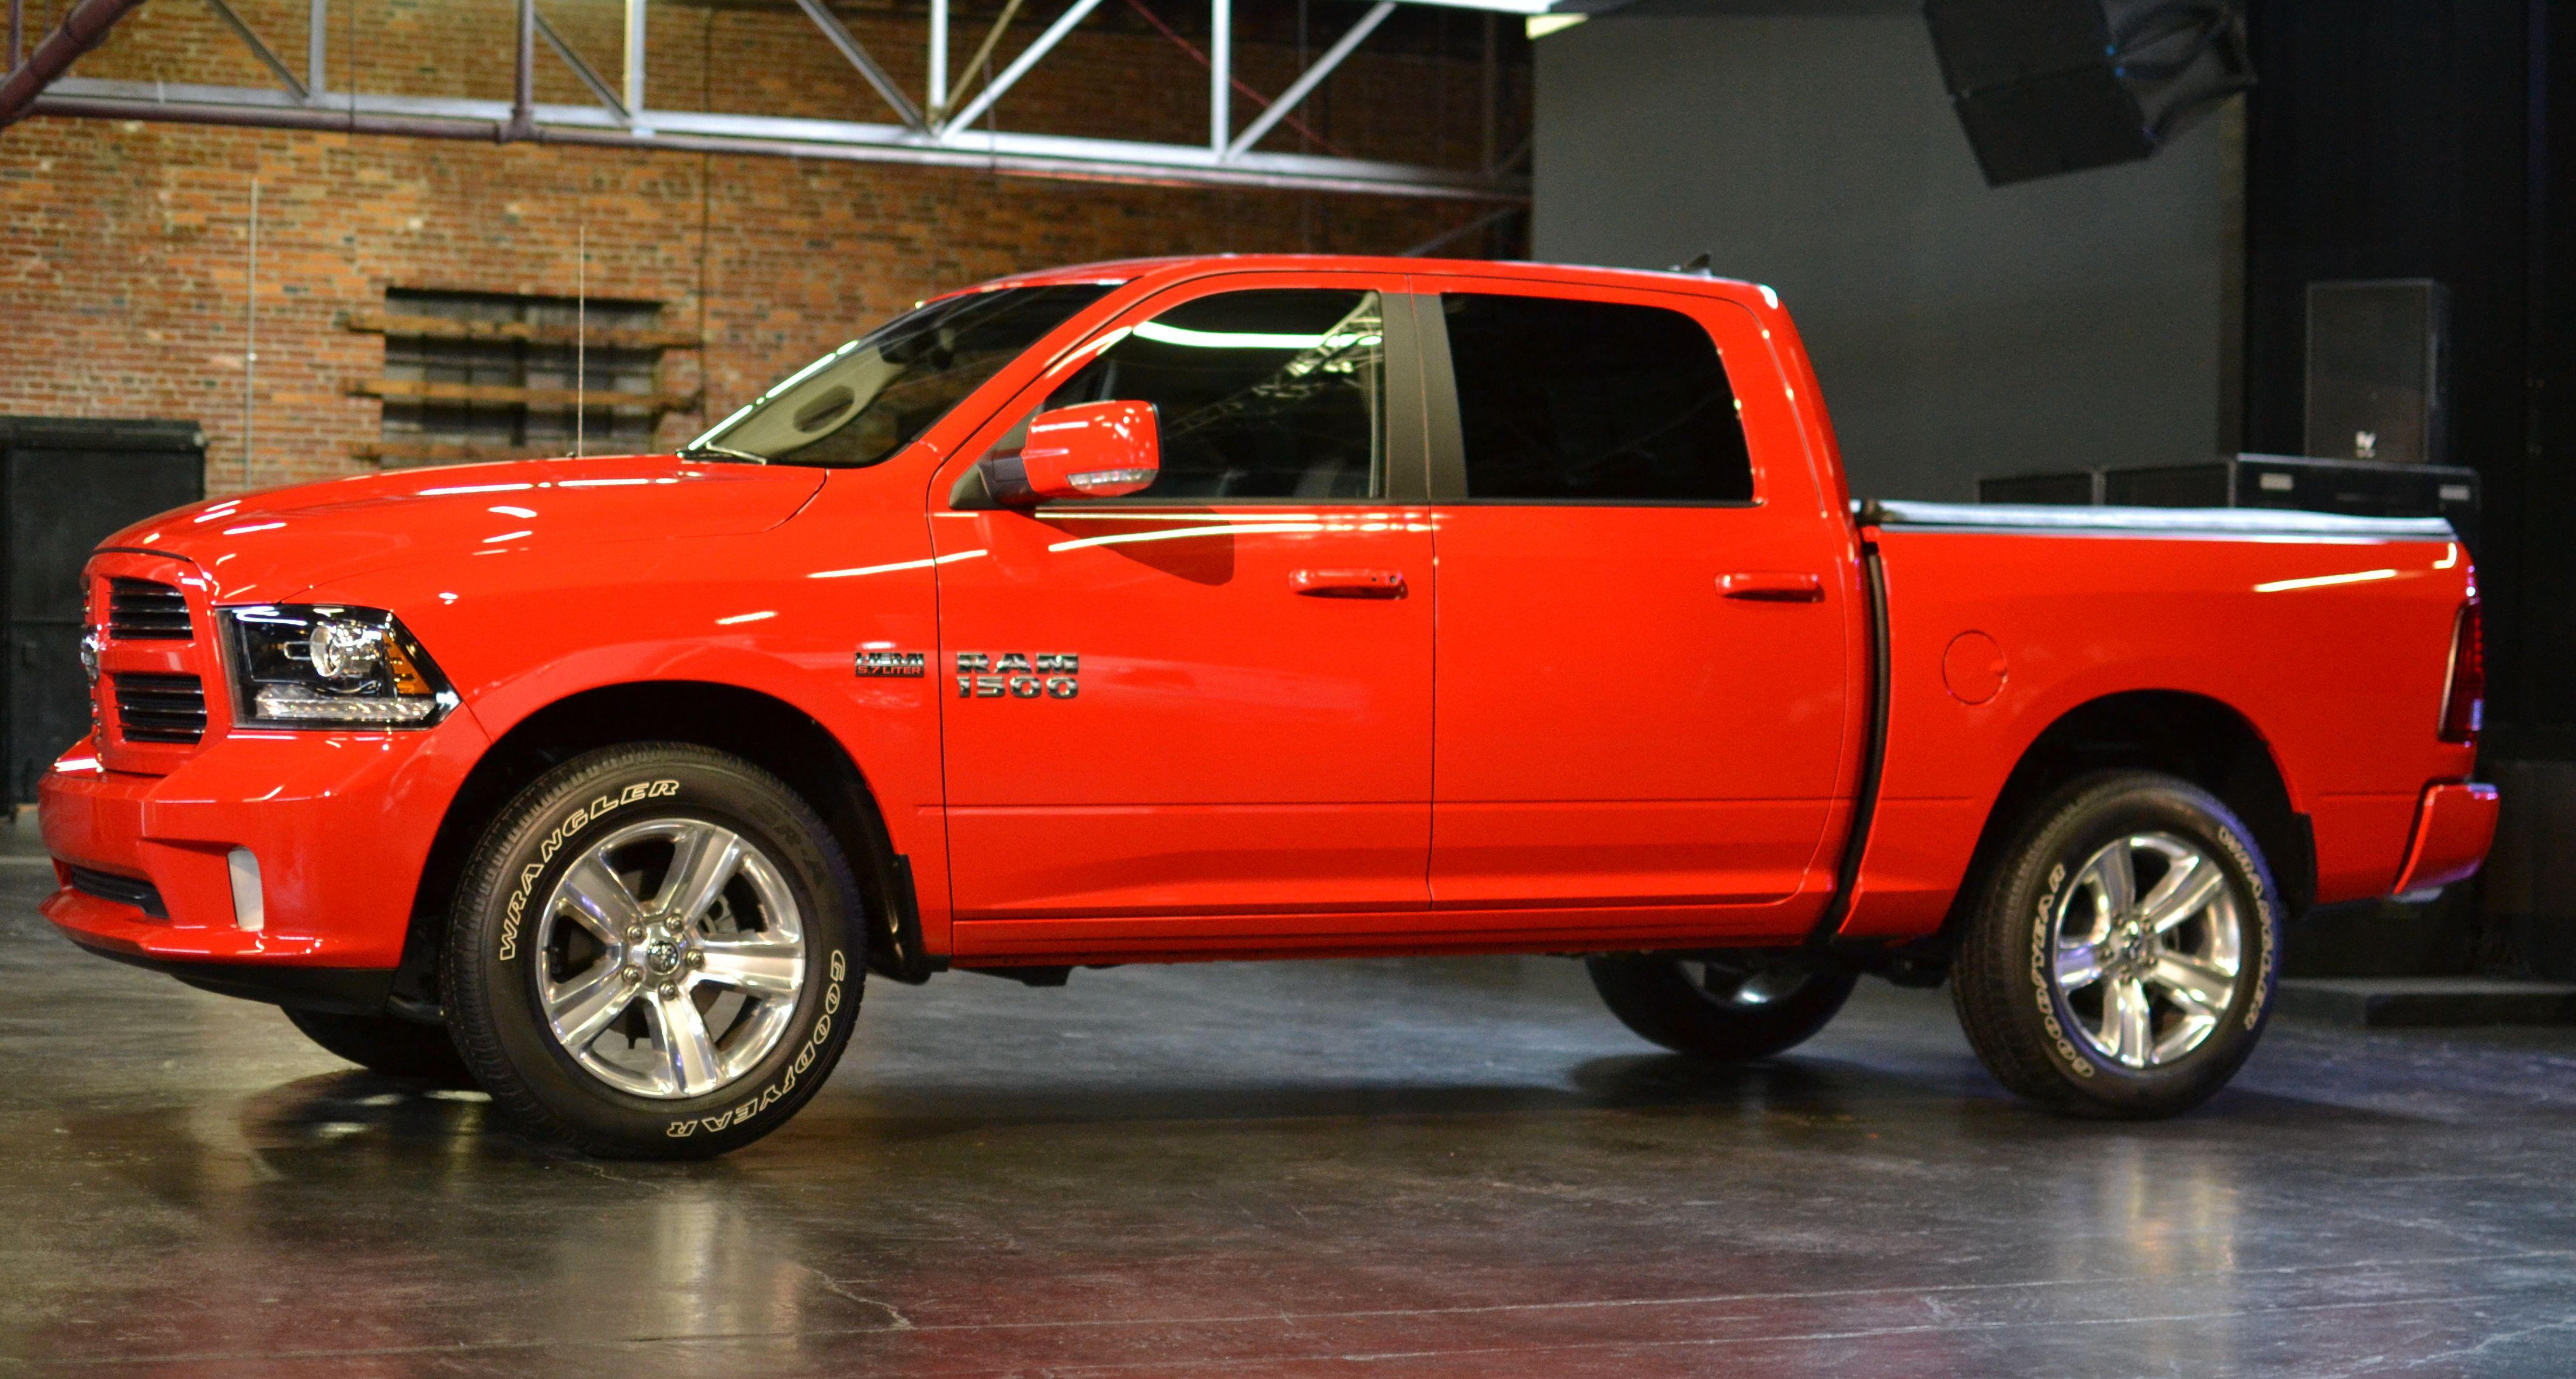 Dodge Ram Lifted Trucks Trucks Pinterest Dodge Rams Dodge Ram - 2014 ram 1500 invoice price